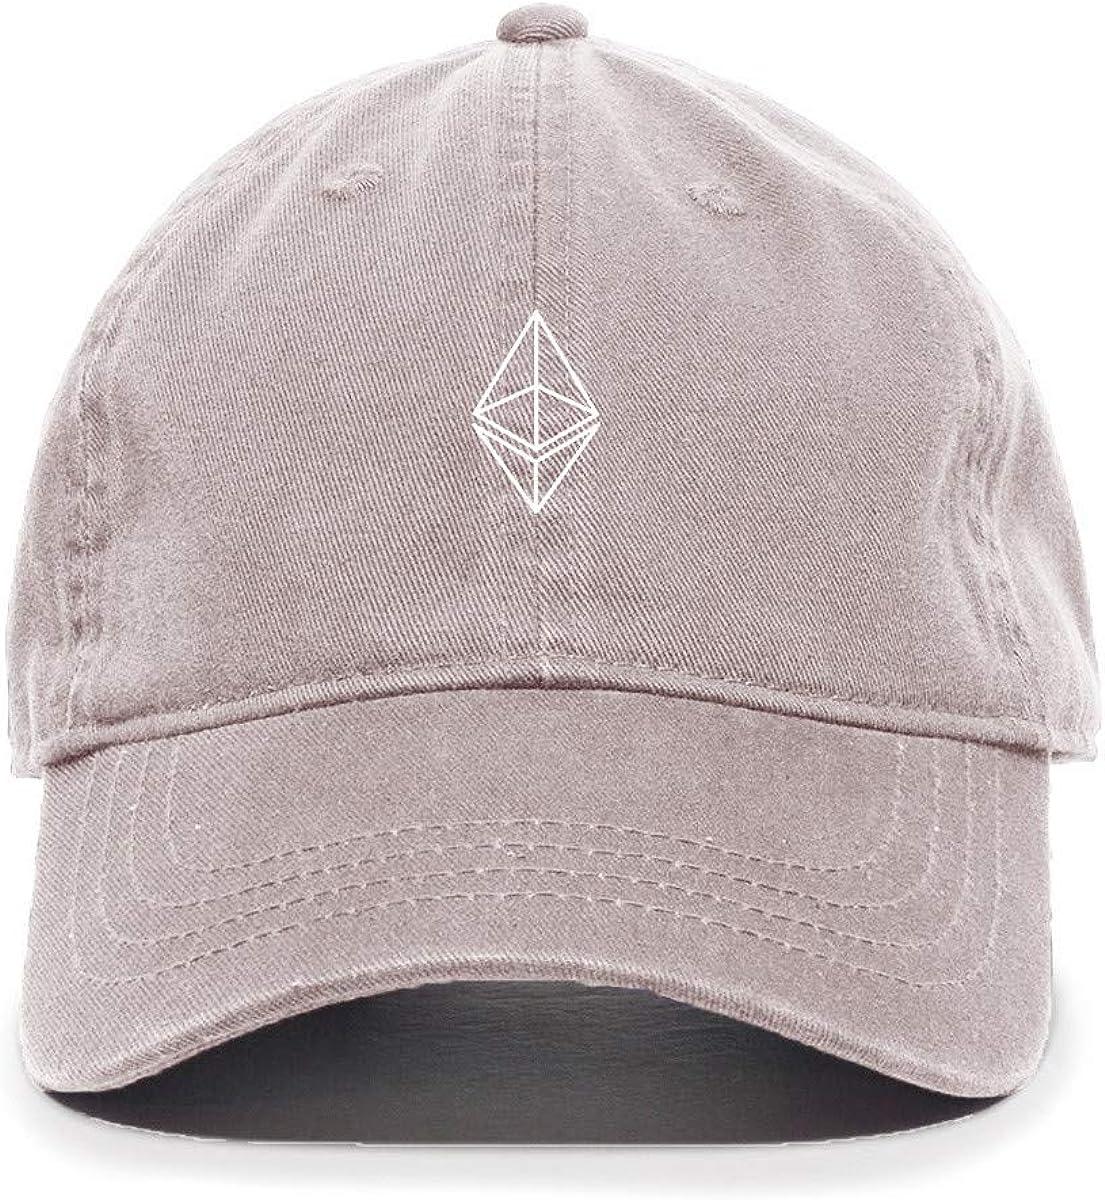 Tech Design San Francisco Mall Regular dealer Ethereum Cryptocurrency Baseball Embroidered Cot Cap